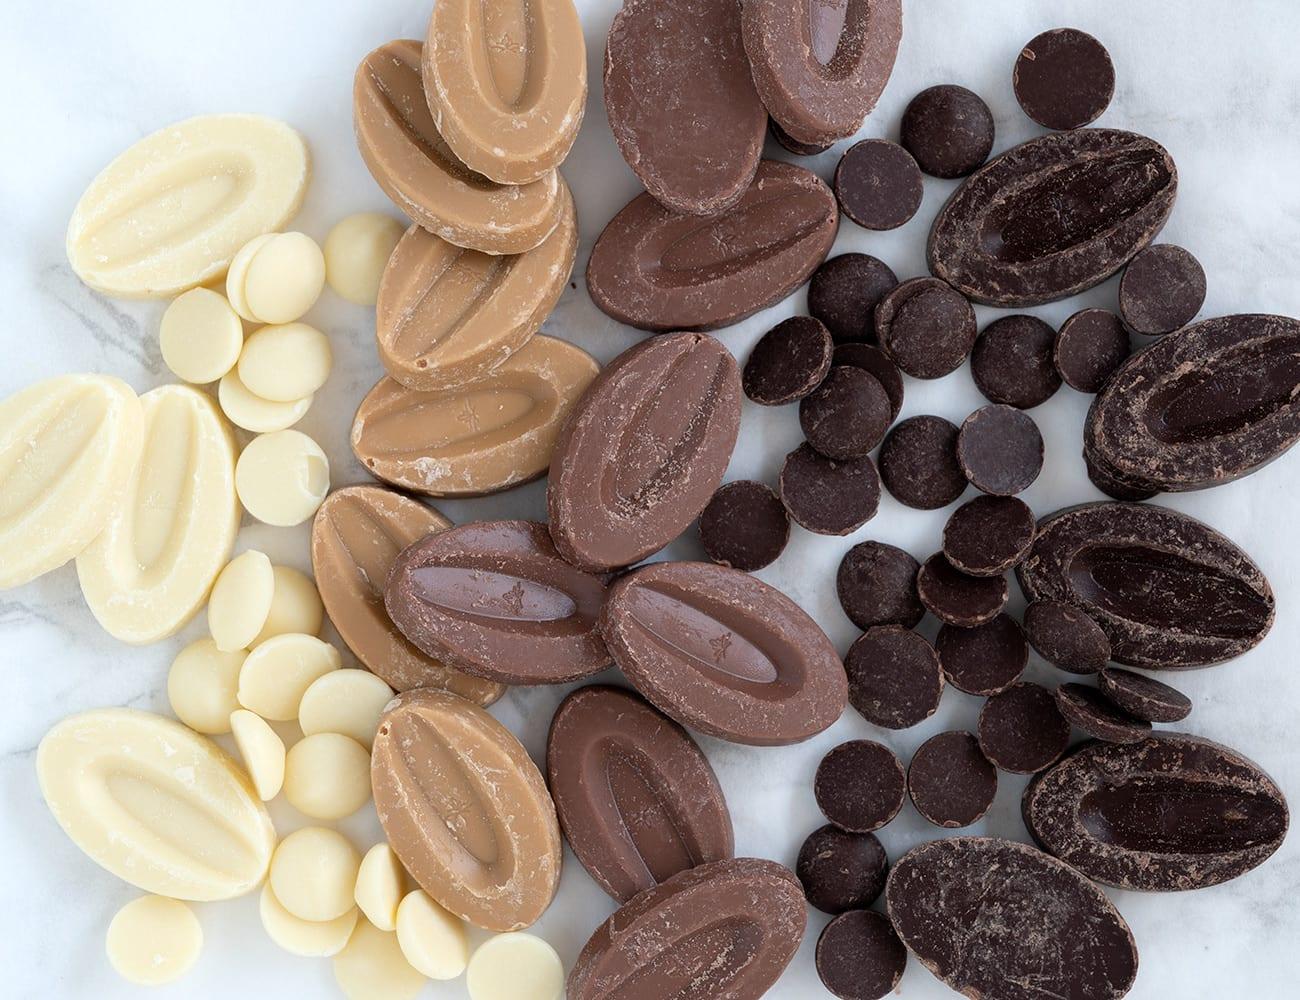 temperere chokolade